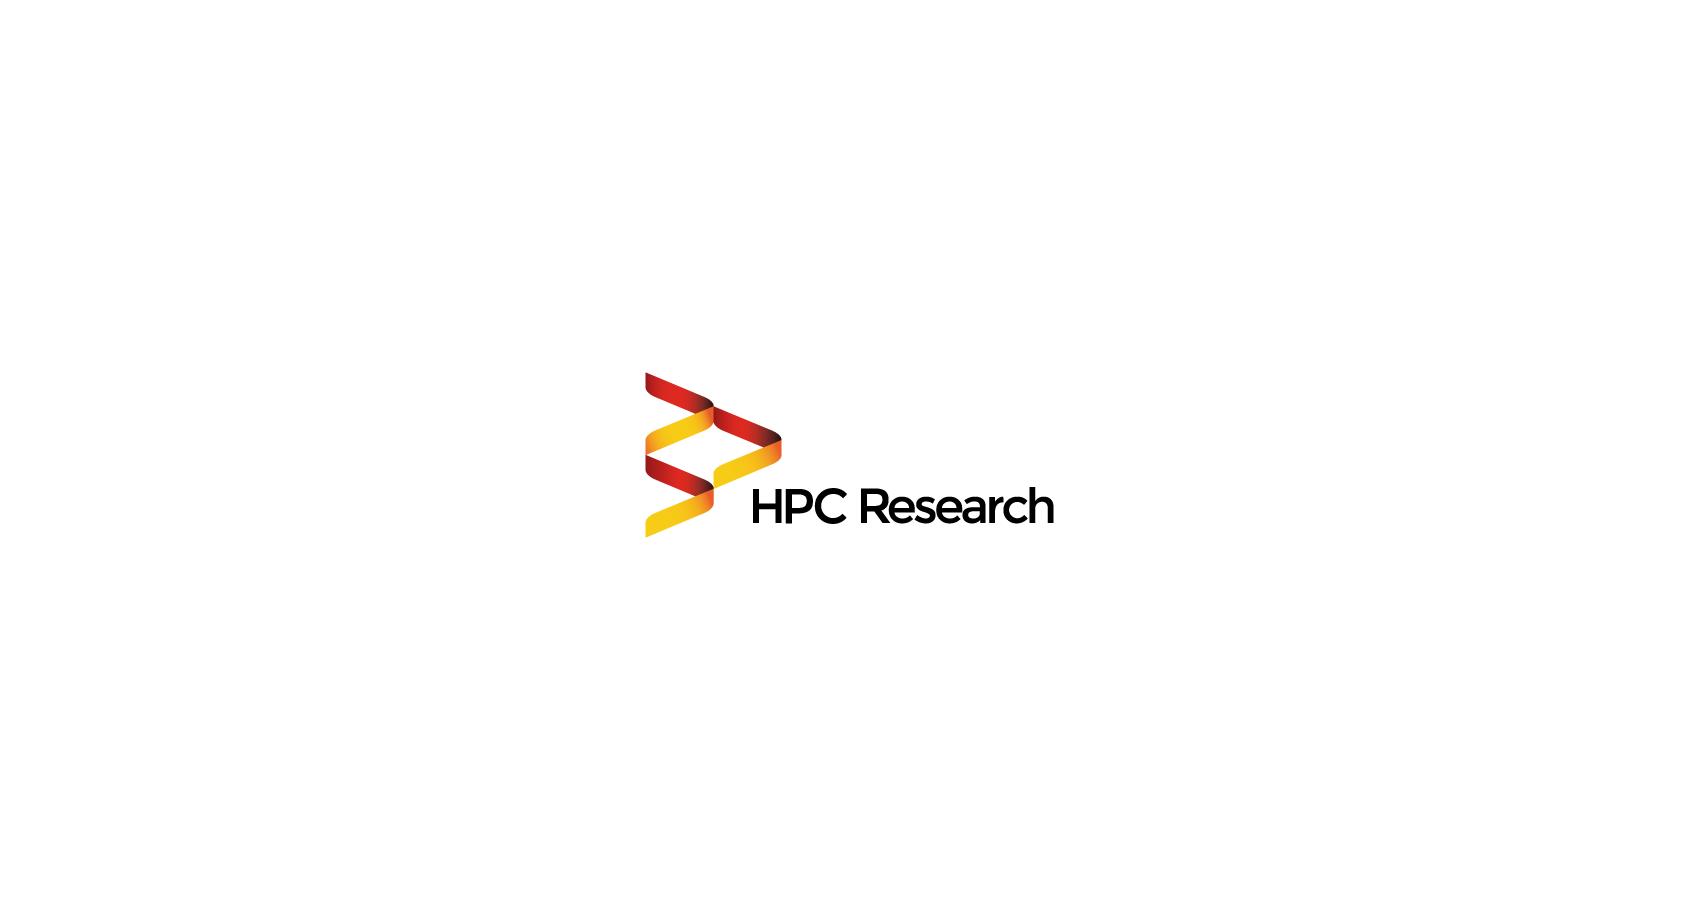 HPCR_logo.png